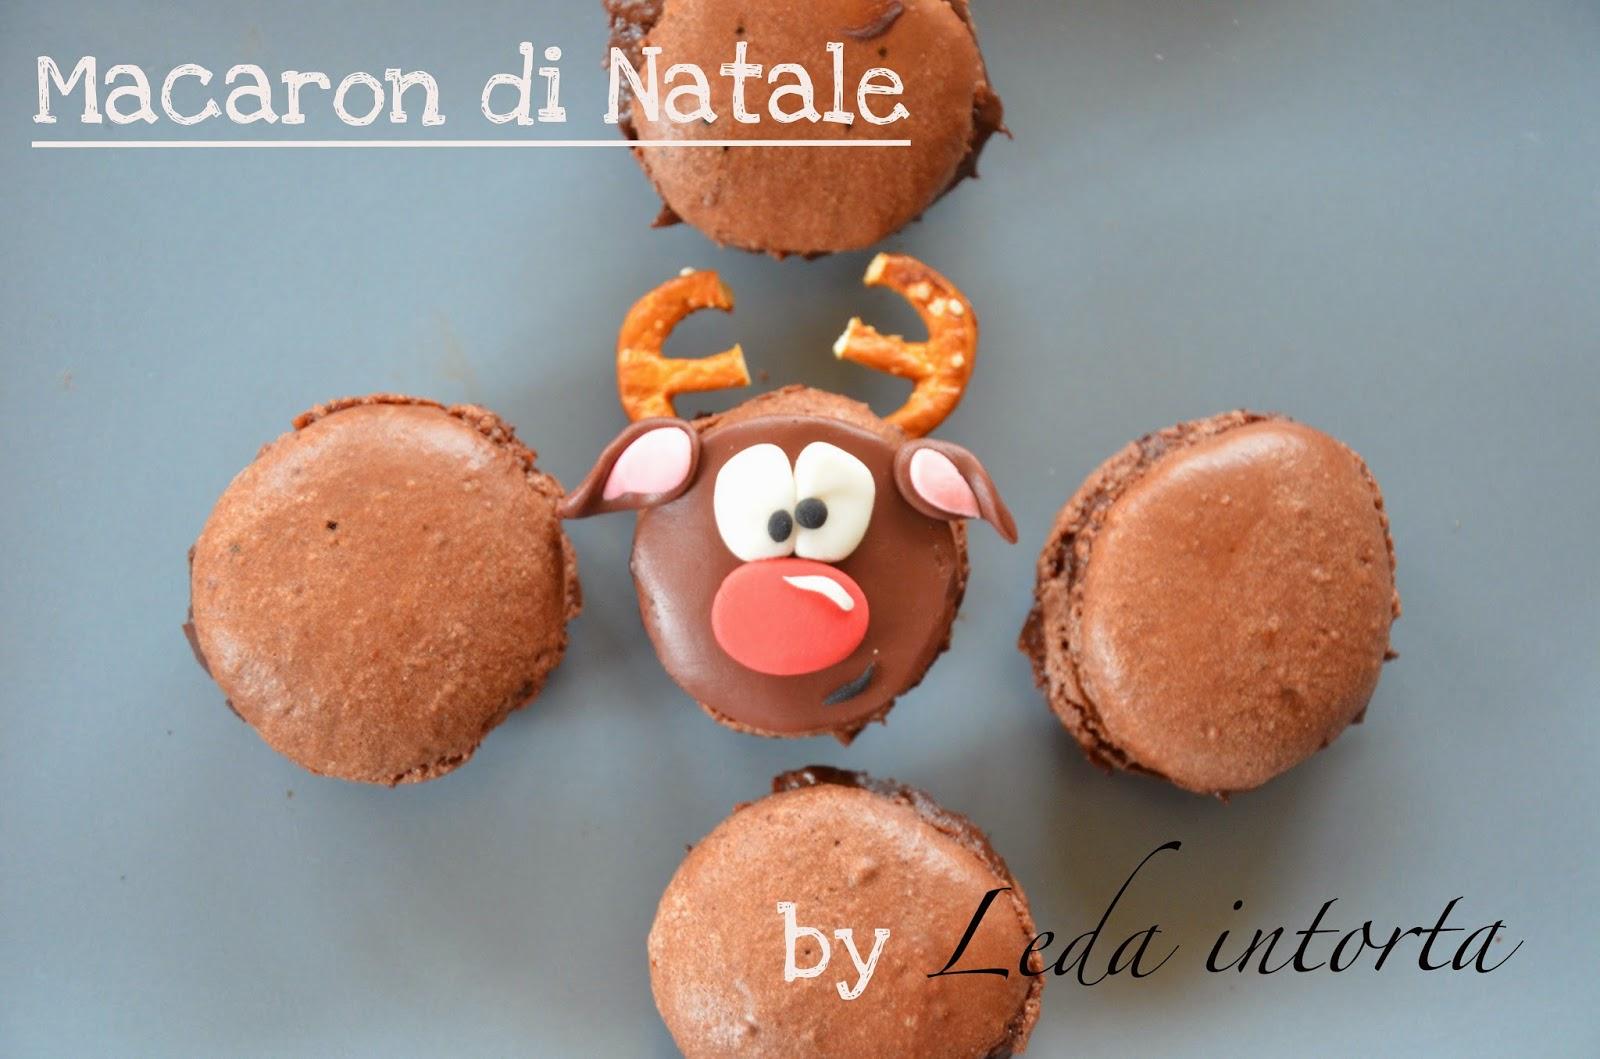 cake design, dolcidee, Leda intorta, tutorial cake design, macaron